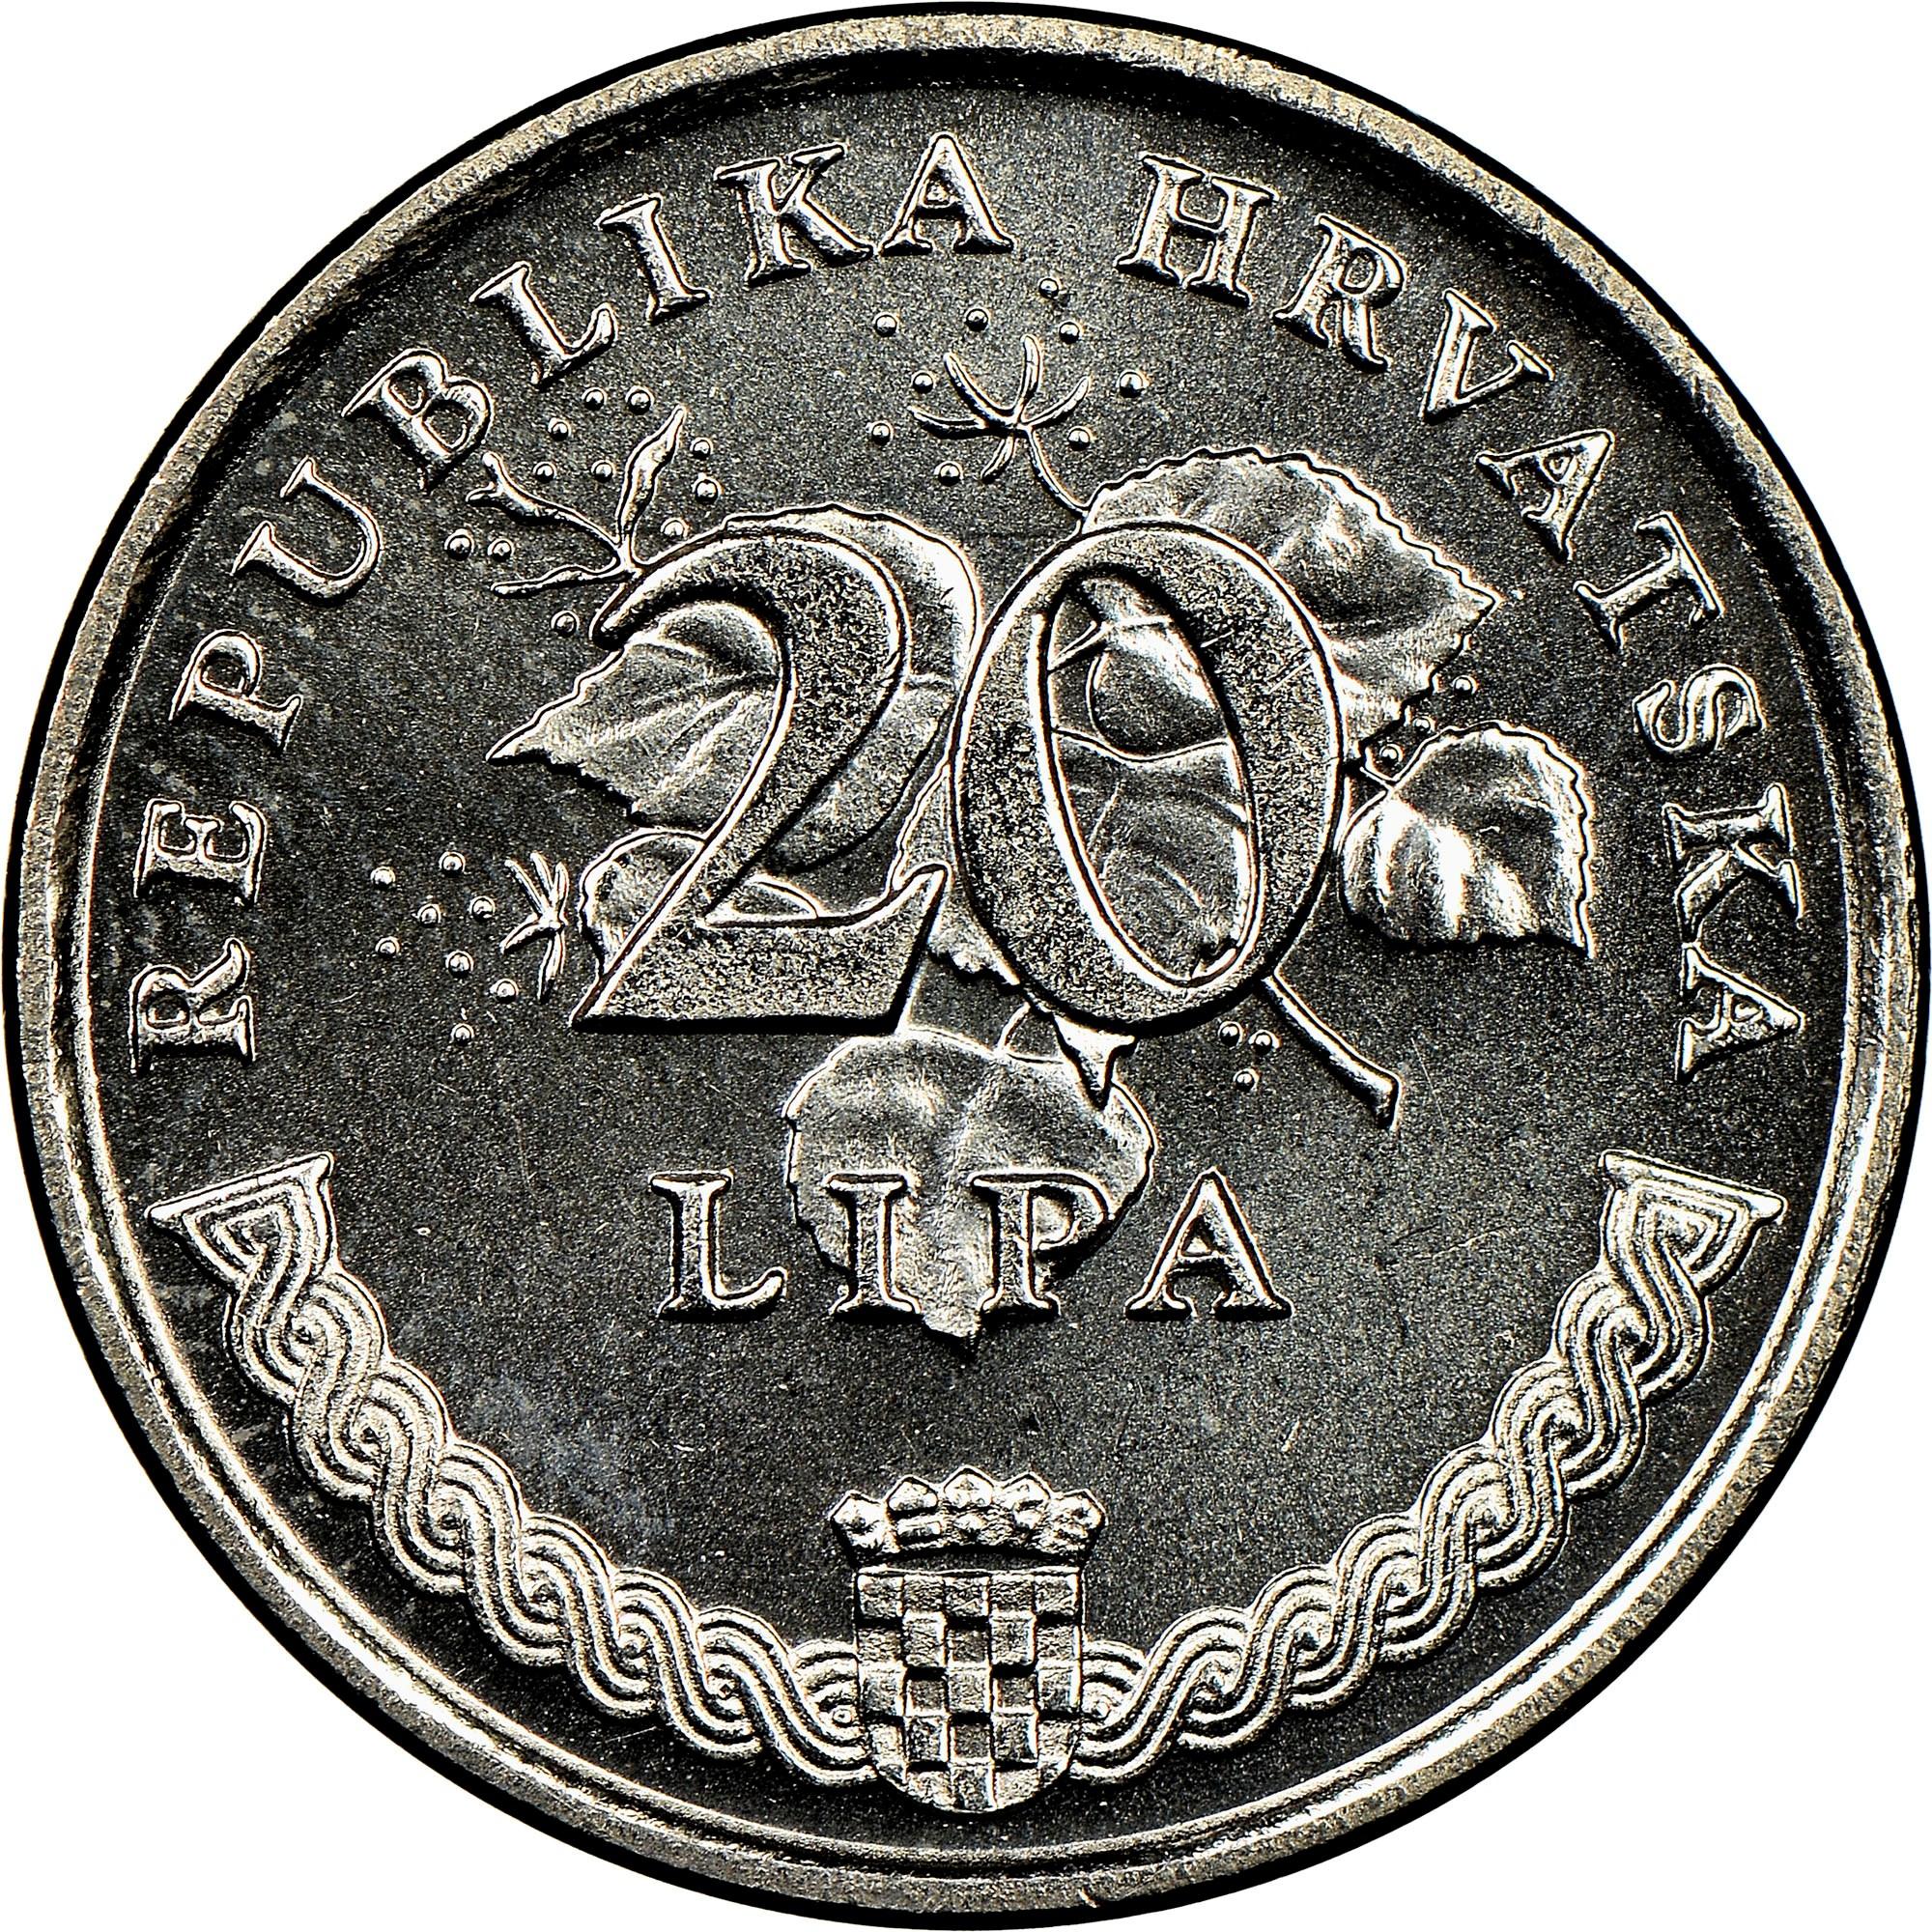 Croatia 20 Lipa obverse